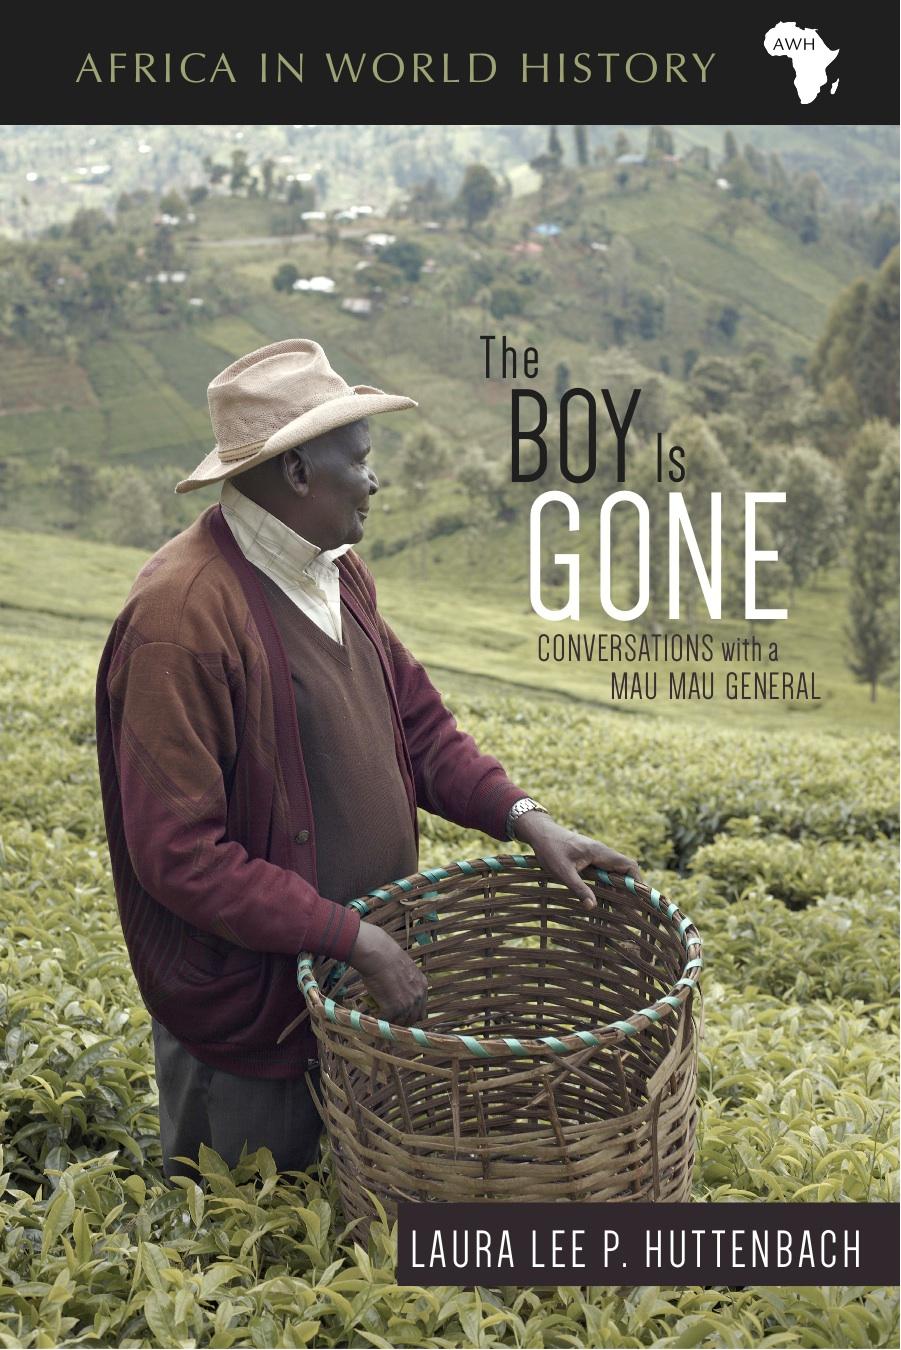 Cover_Boy+Is+Gone.jpg